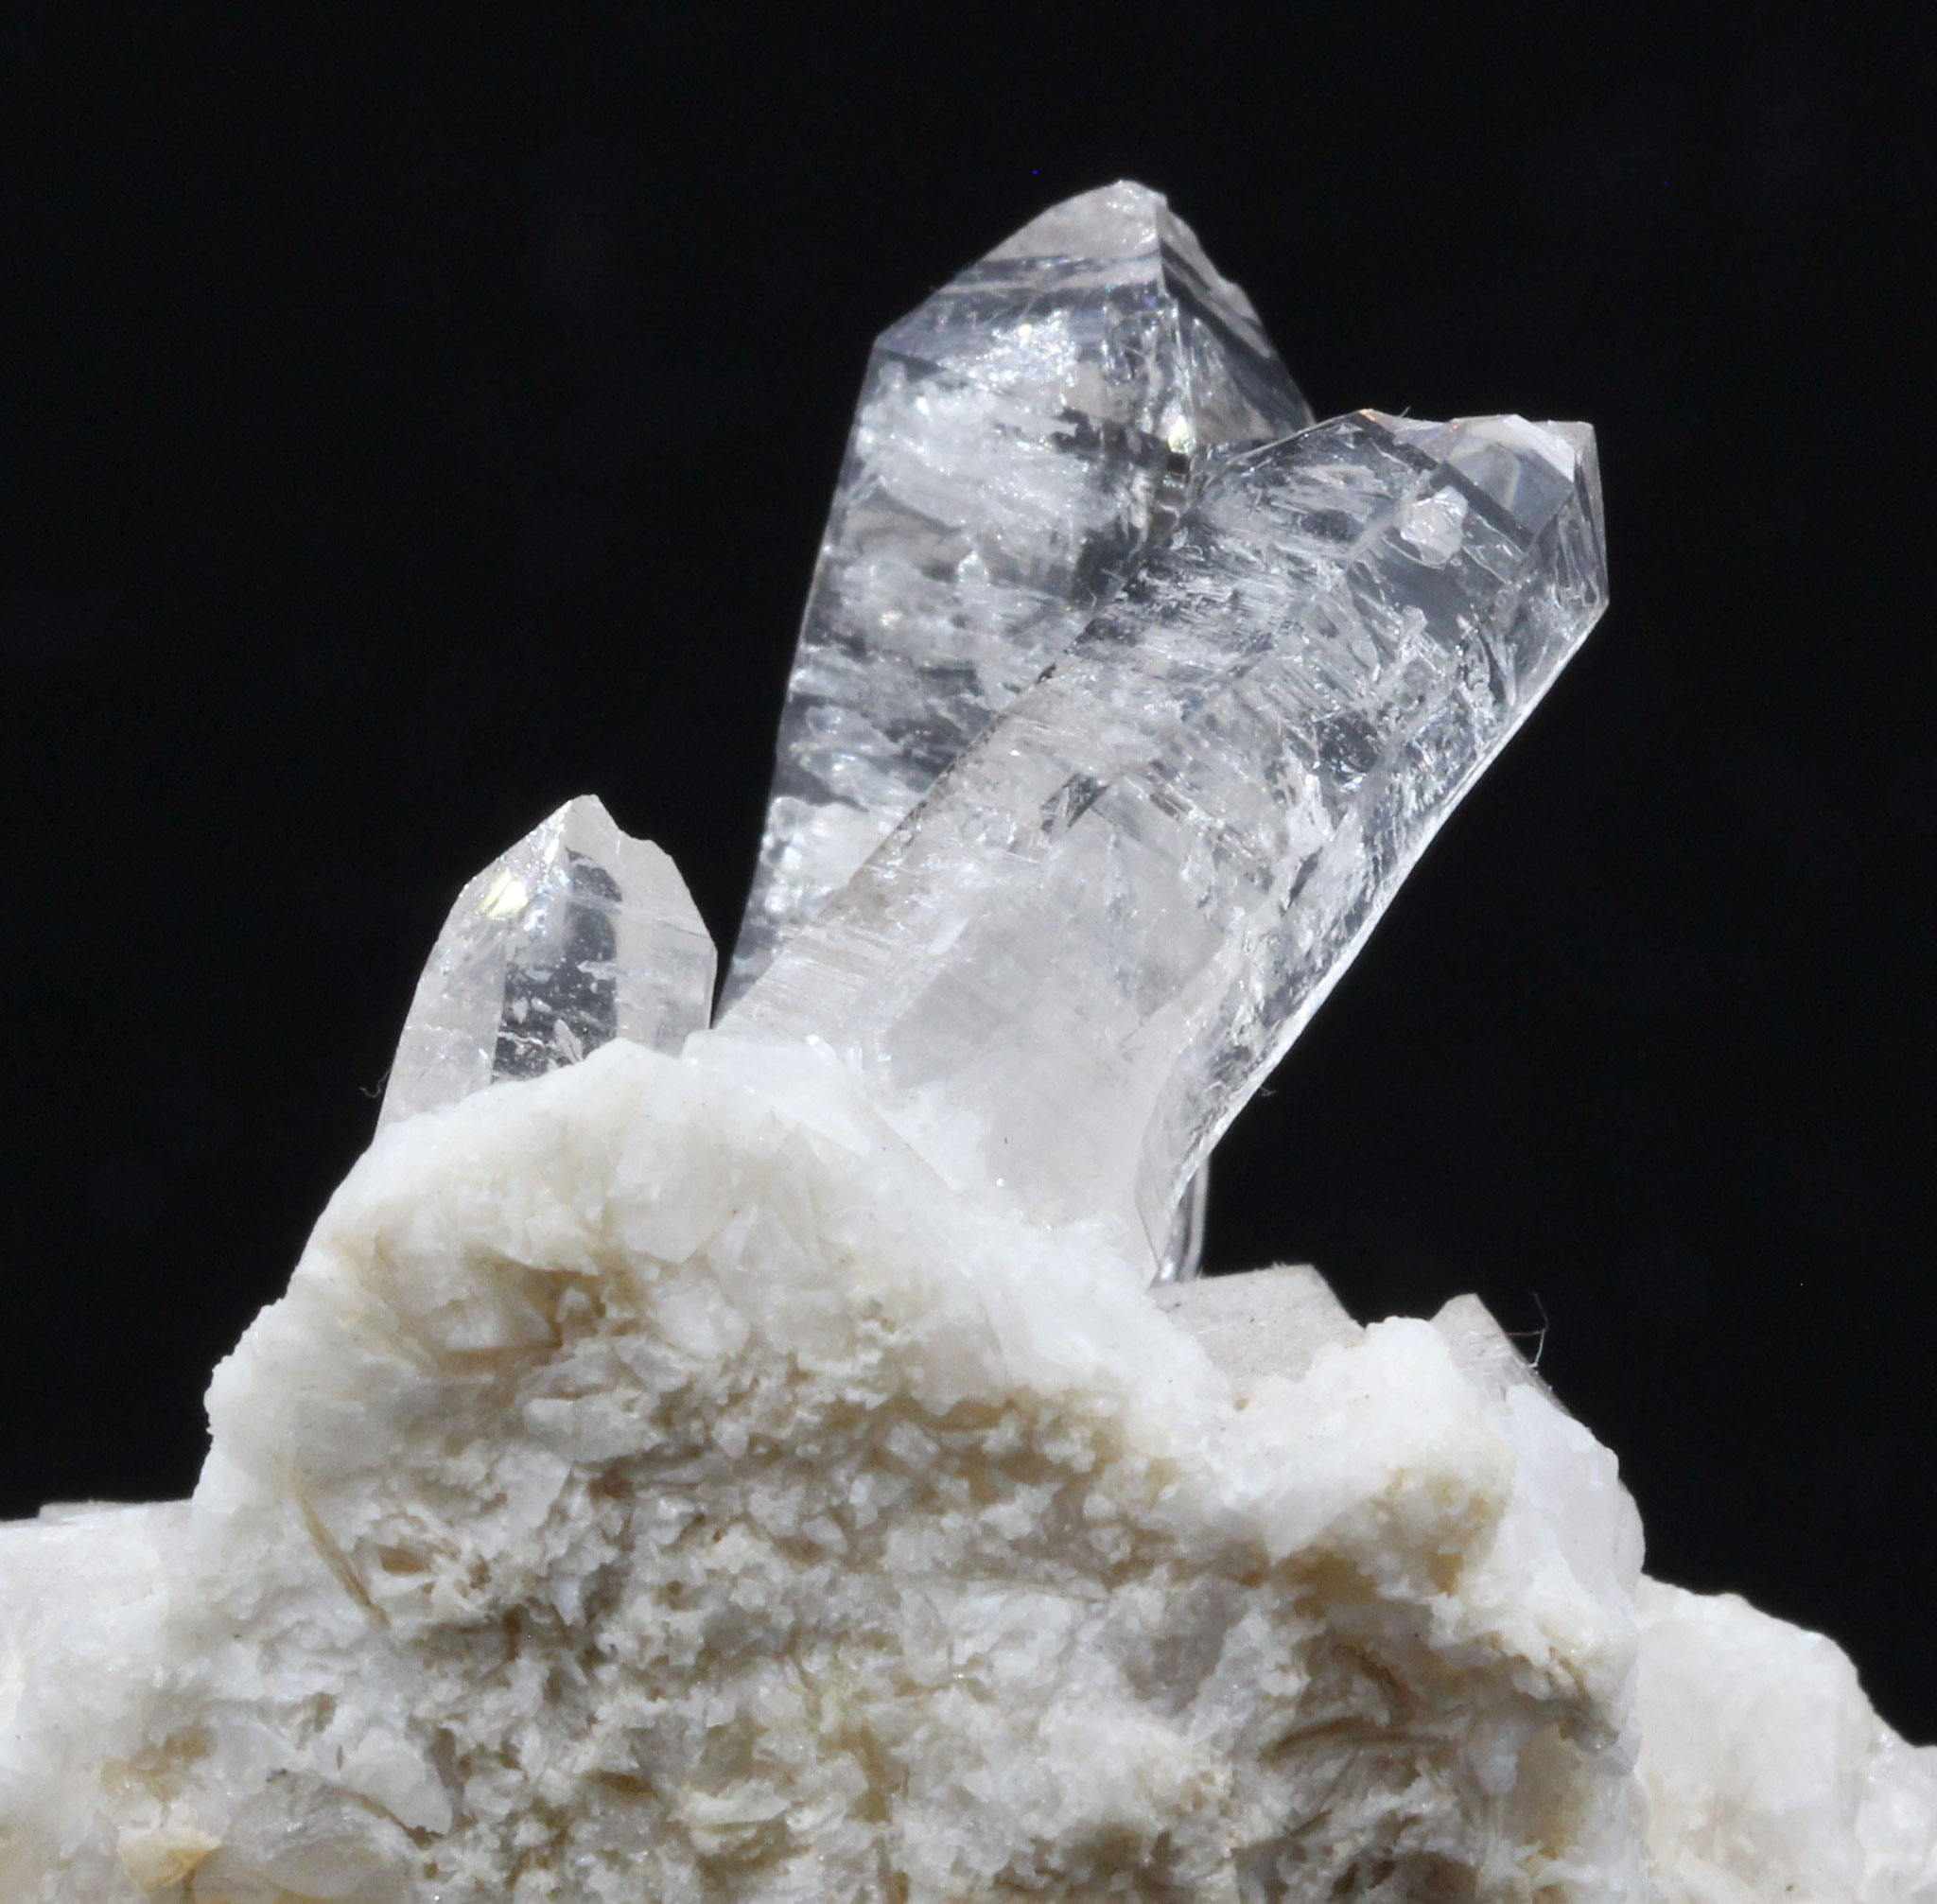 Bergkristall (Muzo Habitus) - Elba